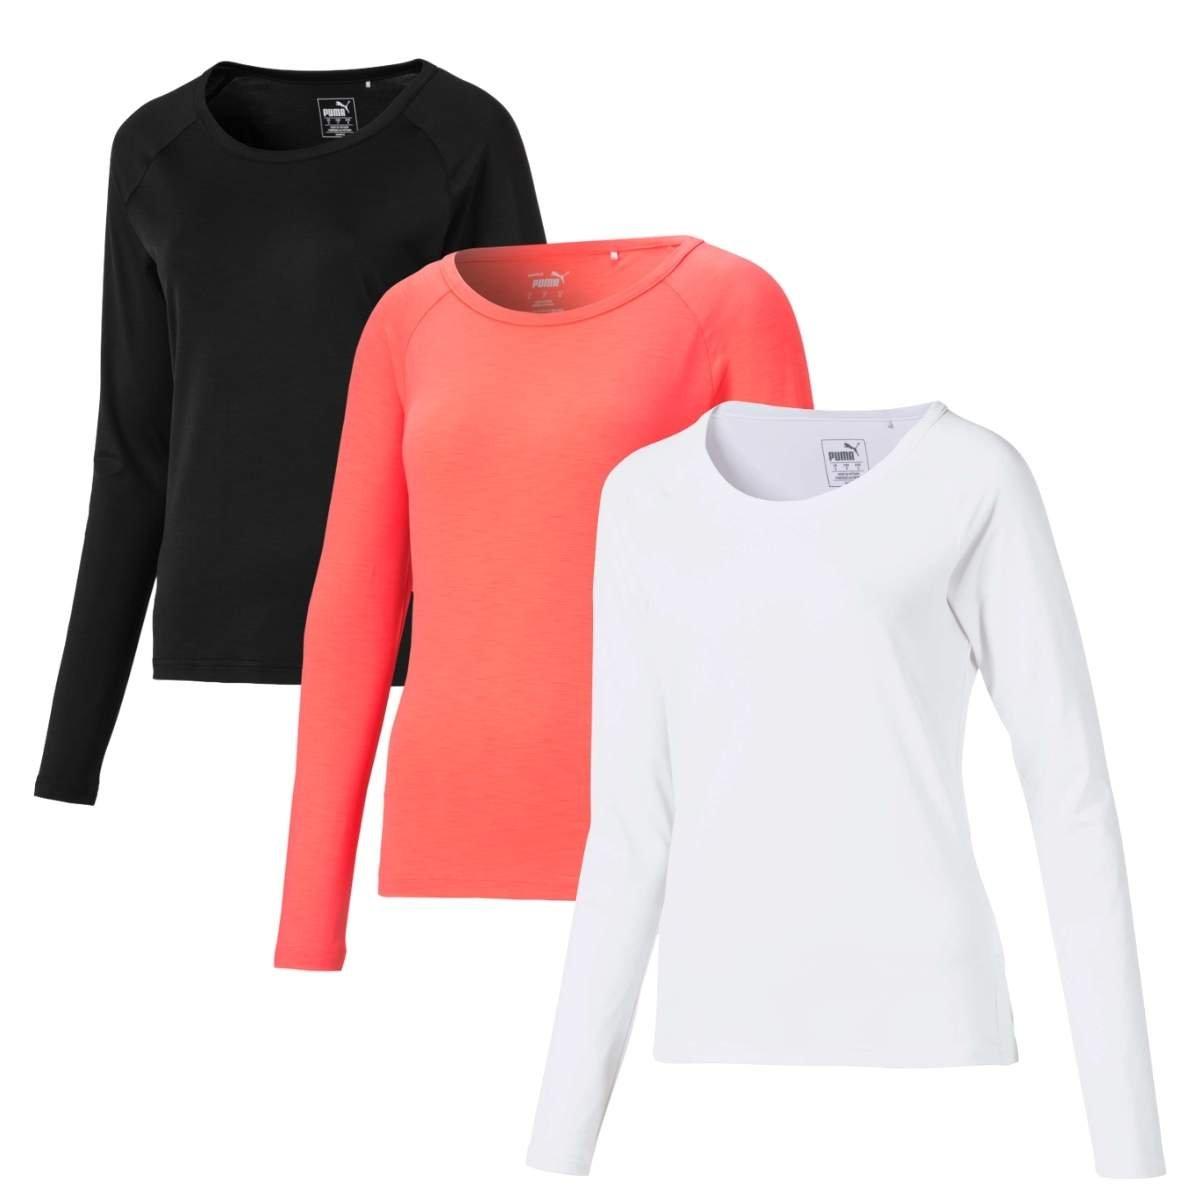 Puma Women's 2021 Longsleeve Sun Crew Shirt